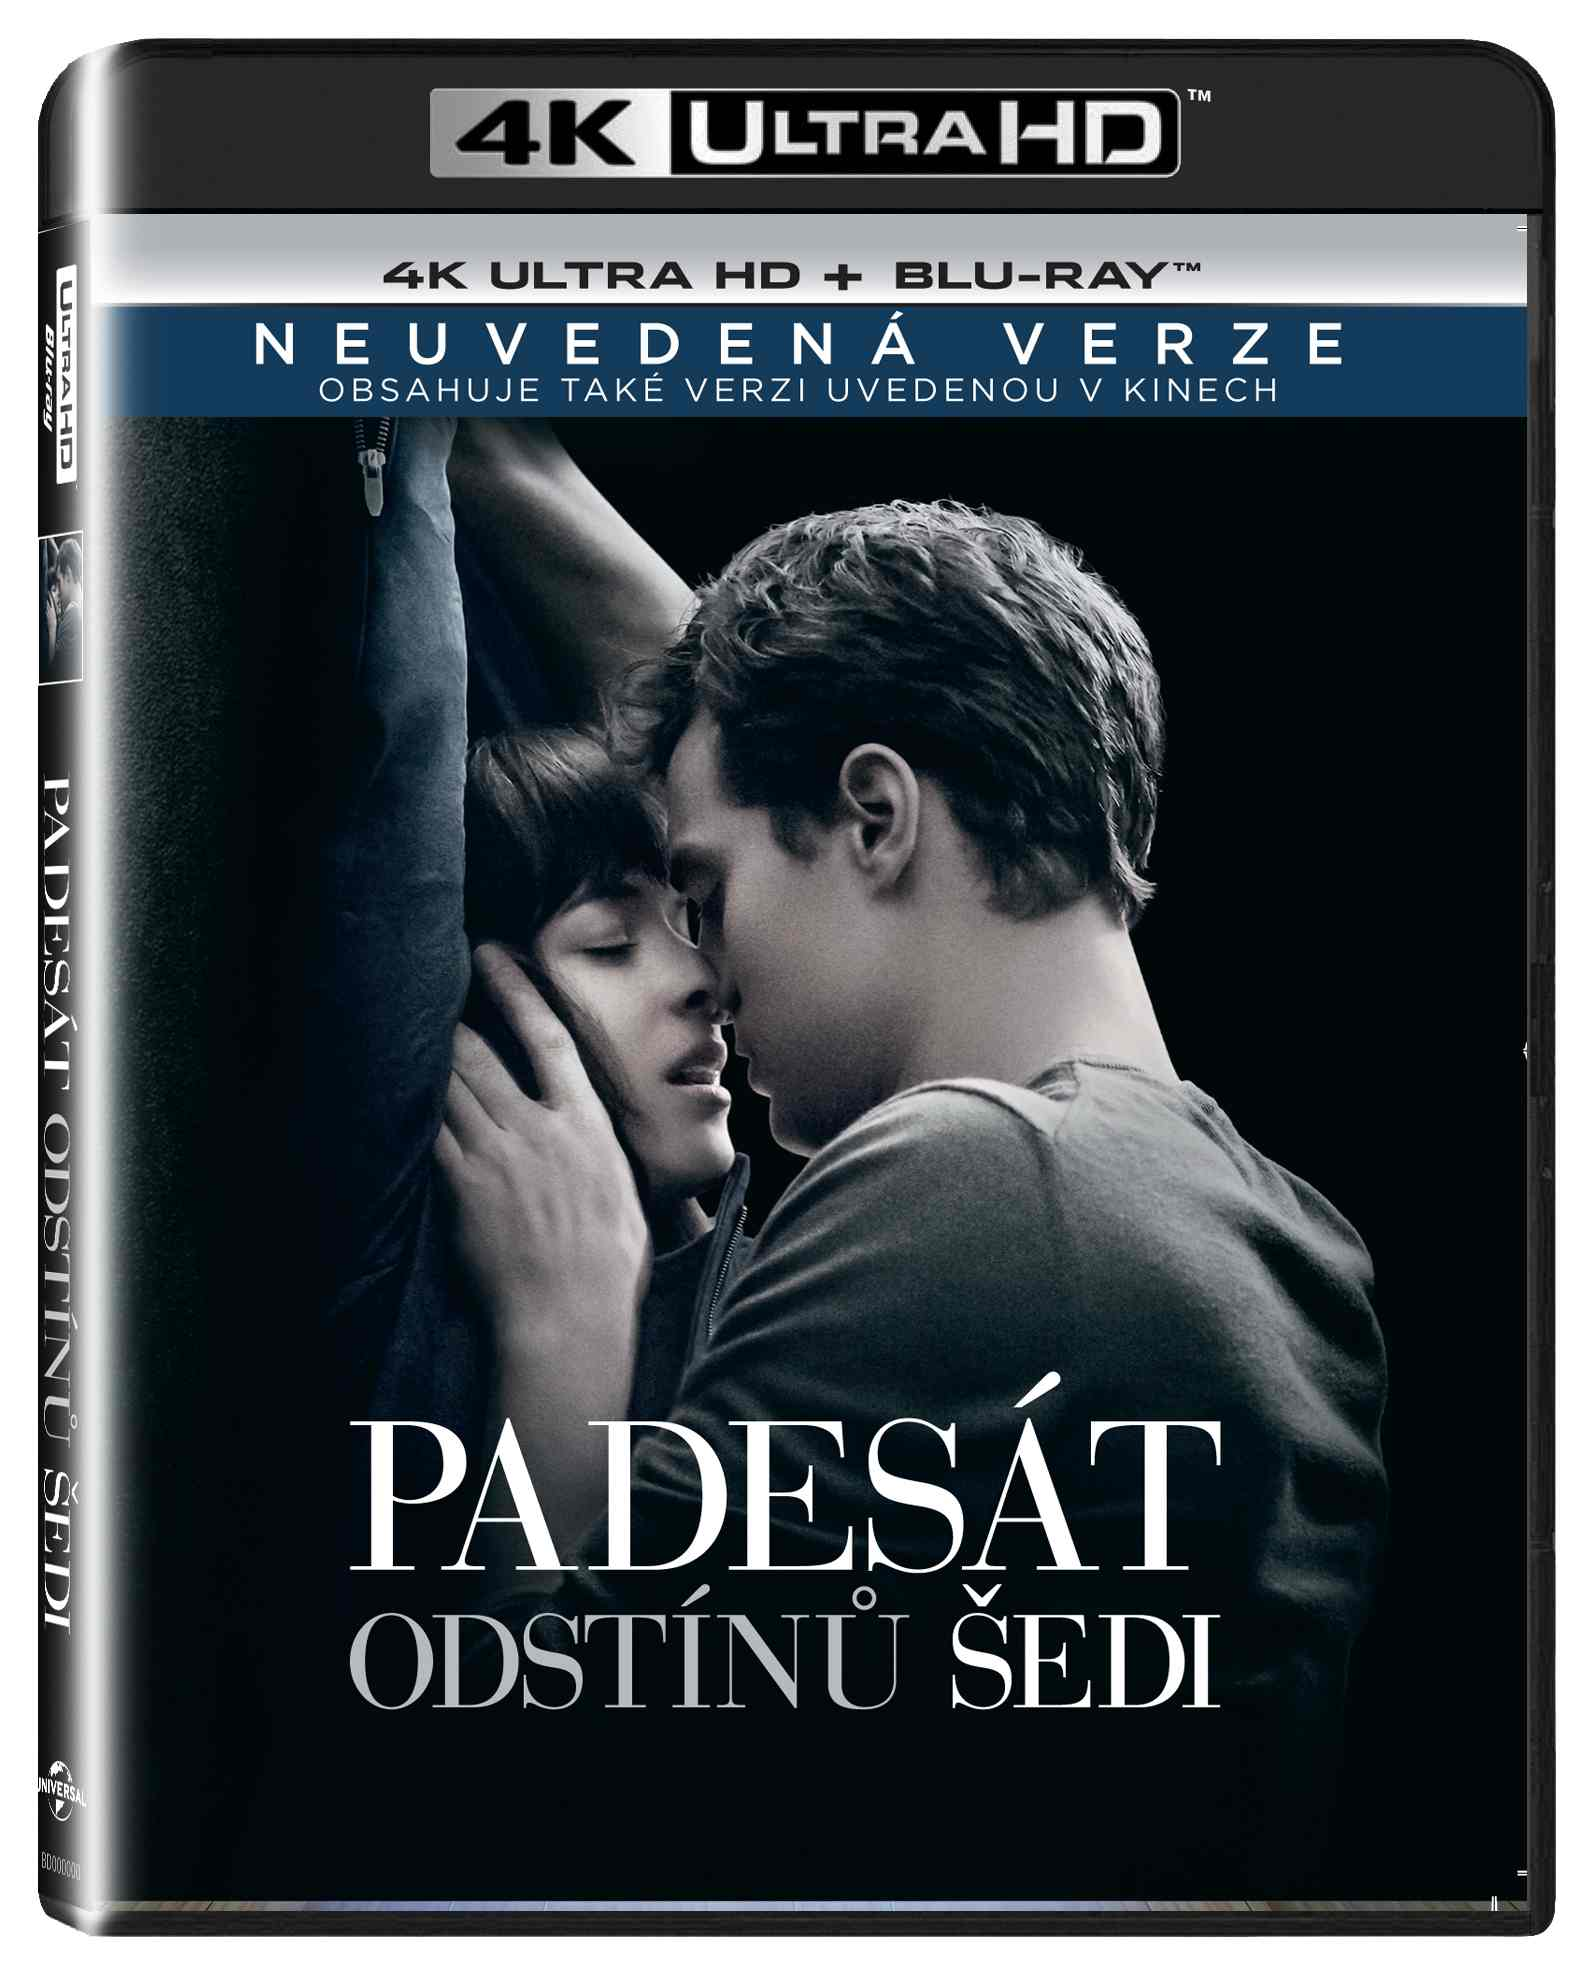 PADESÁT ODSTÍNŮ ŠEDI (4K ULTRA HD) - UHD Blu-ray + Blu-ray (2 BD)